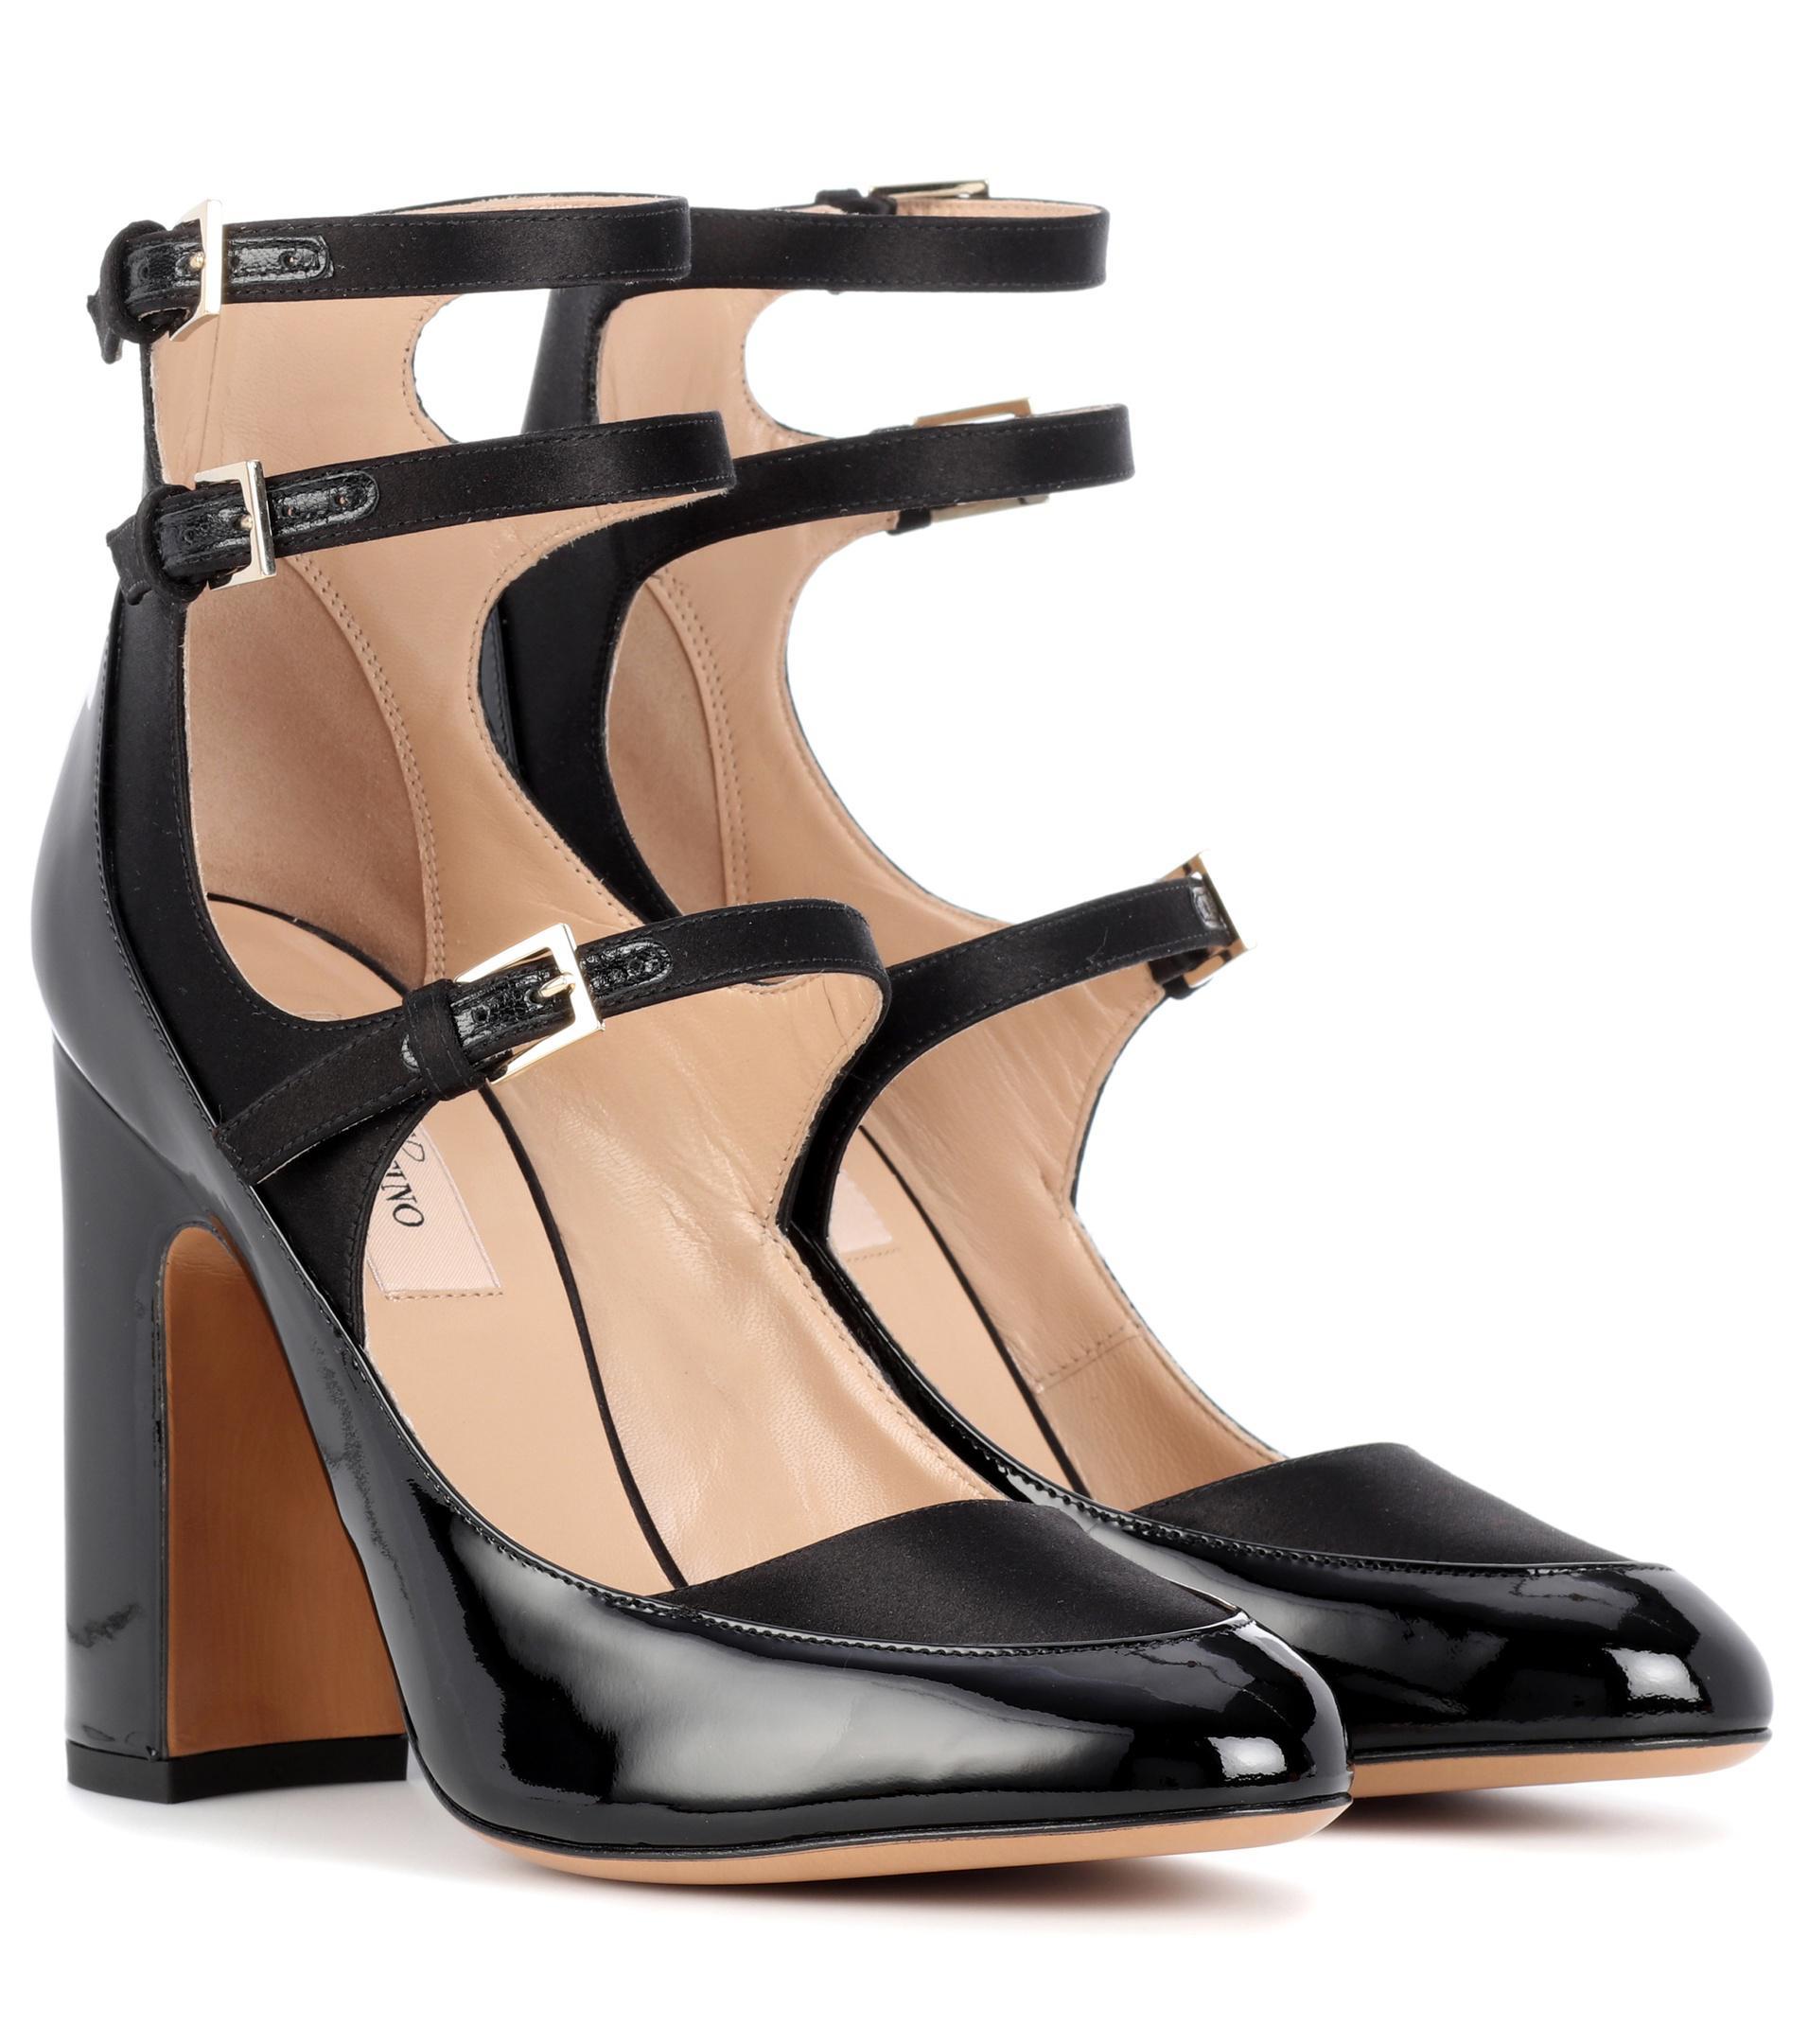 Valentino Garavani patent leather and satin pumps ZsIyZy3